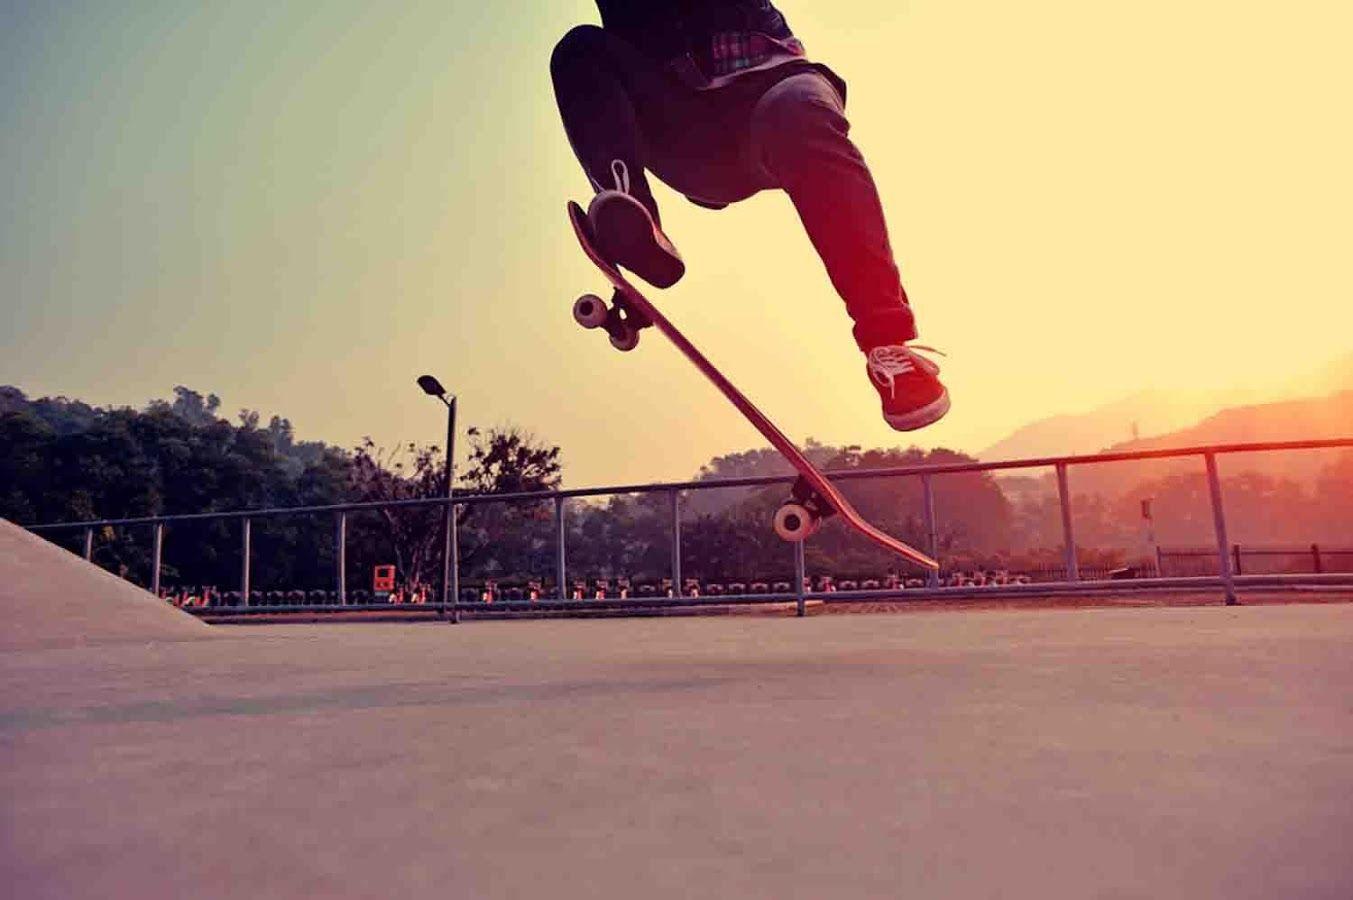 Skater Wallpapers On Wallpaperdog